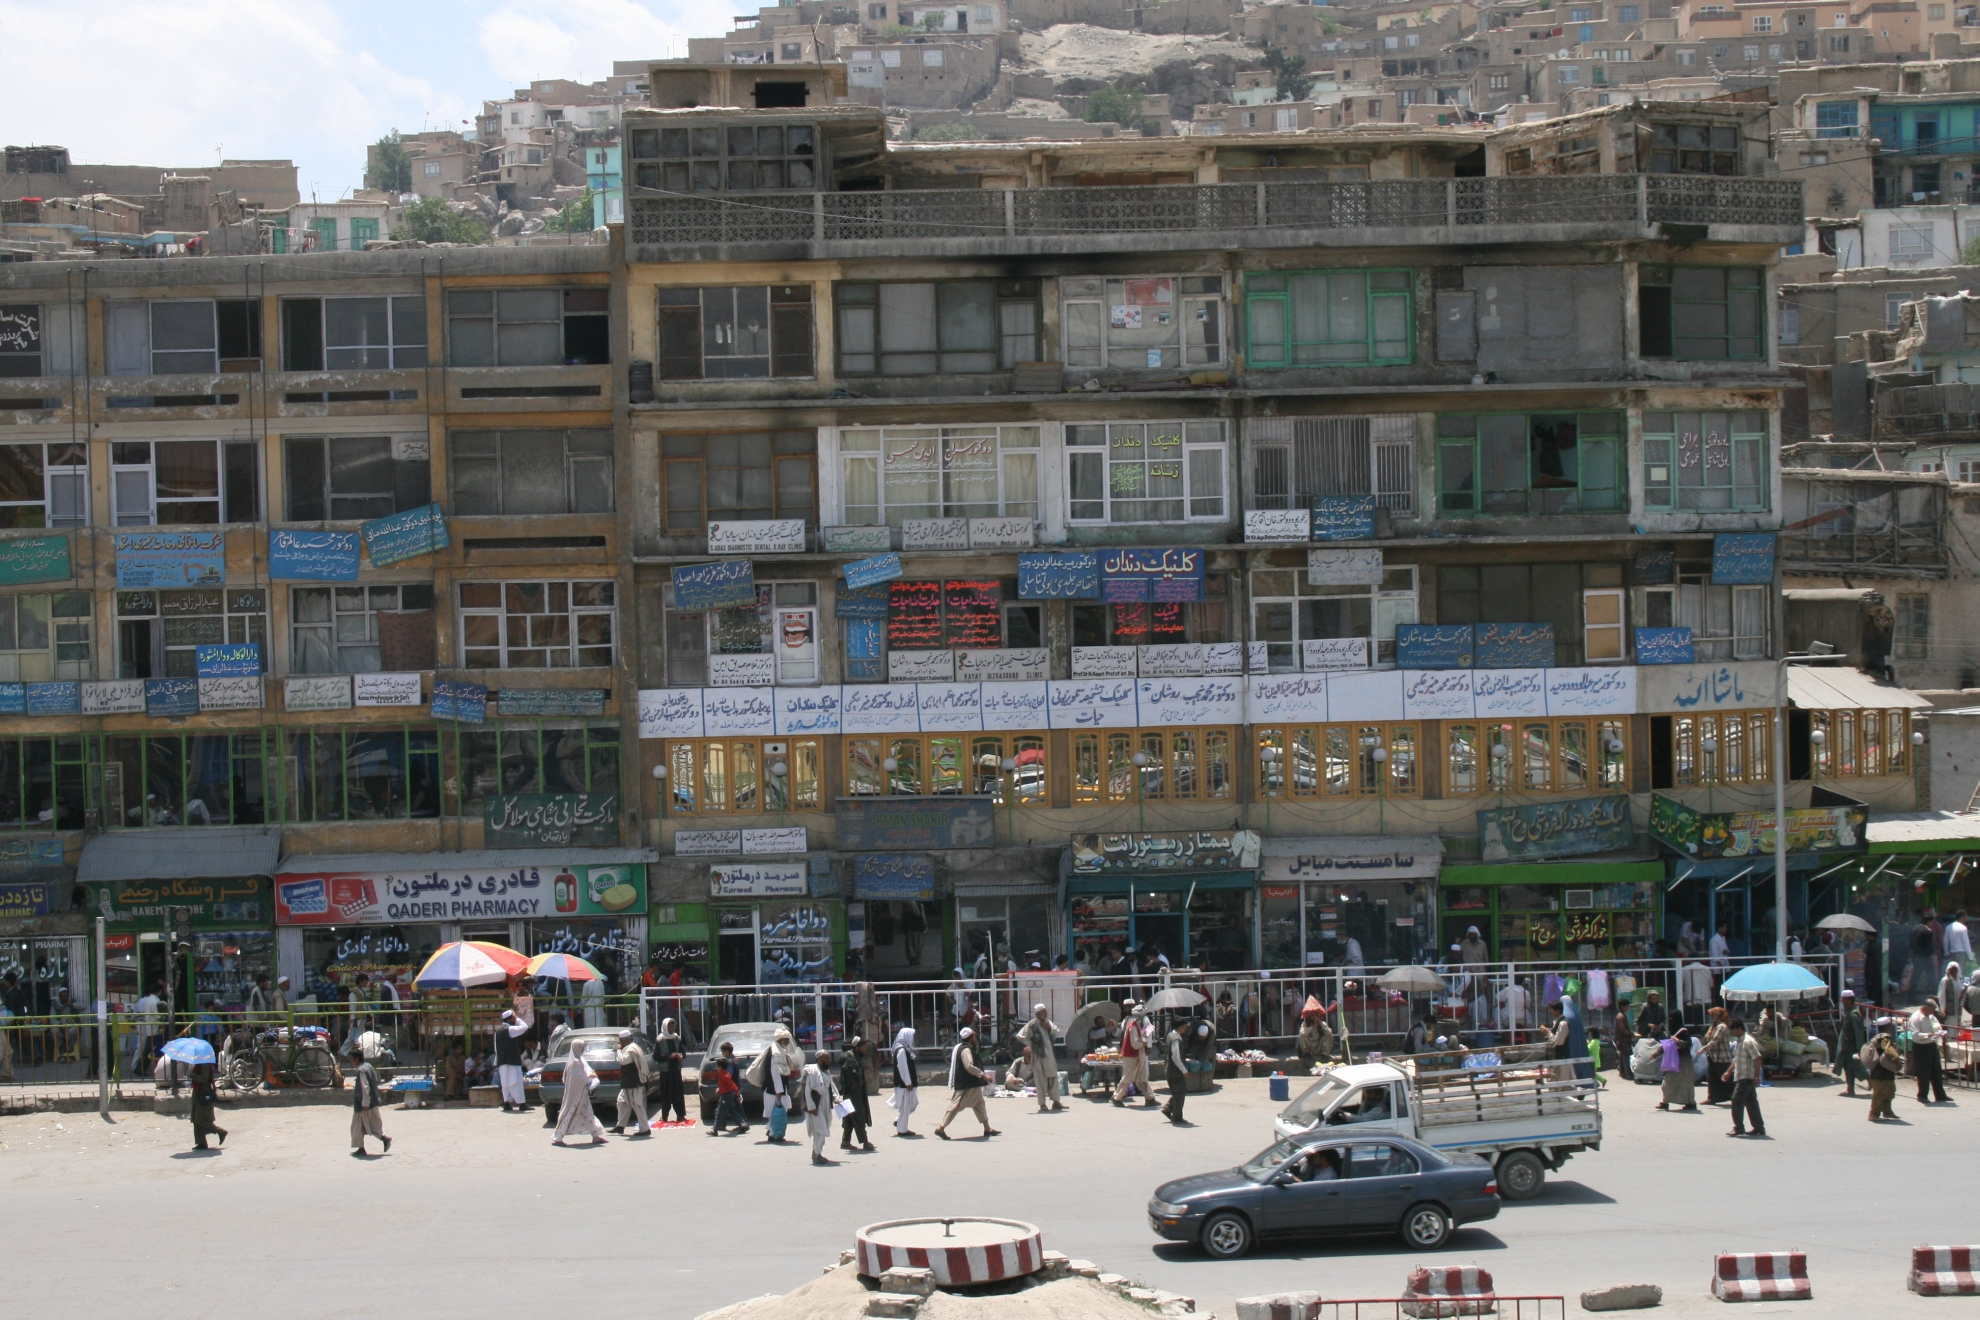 The busy streets of Kabul, where Hadi sells his phone cards. Photo: Tahir Bakhtiary